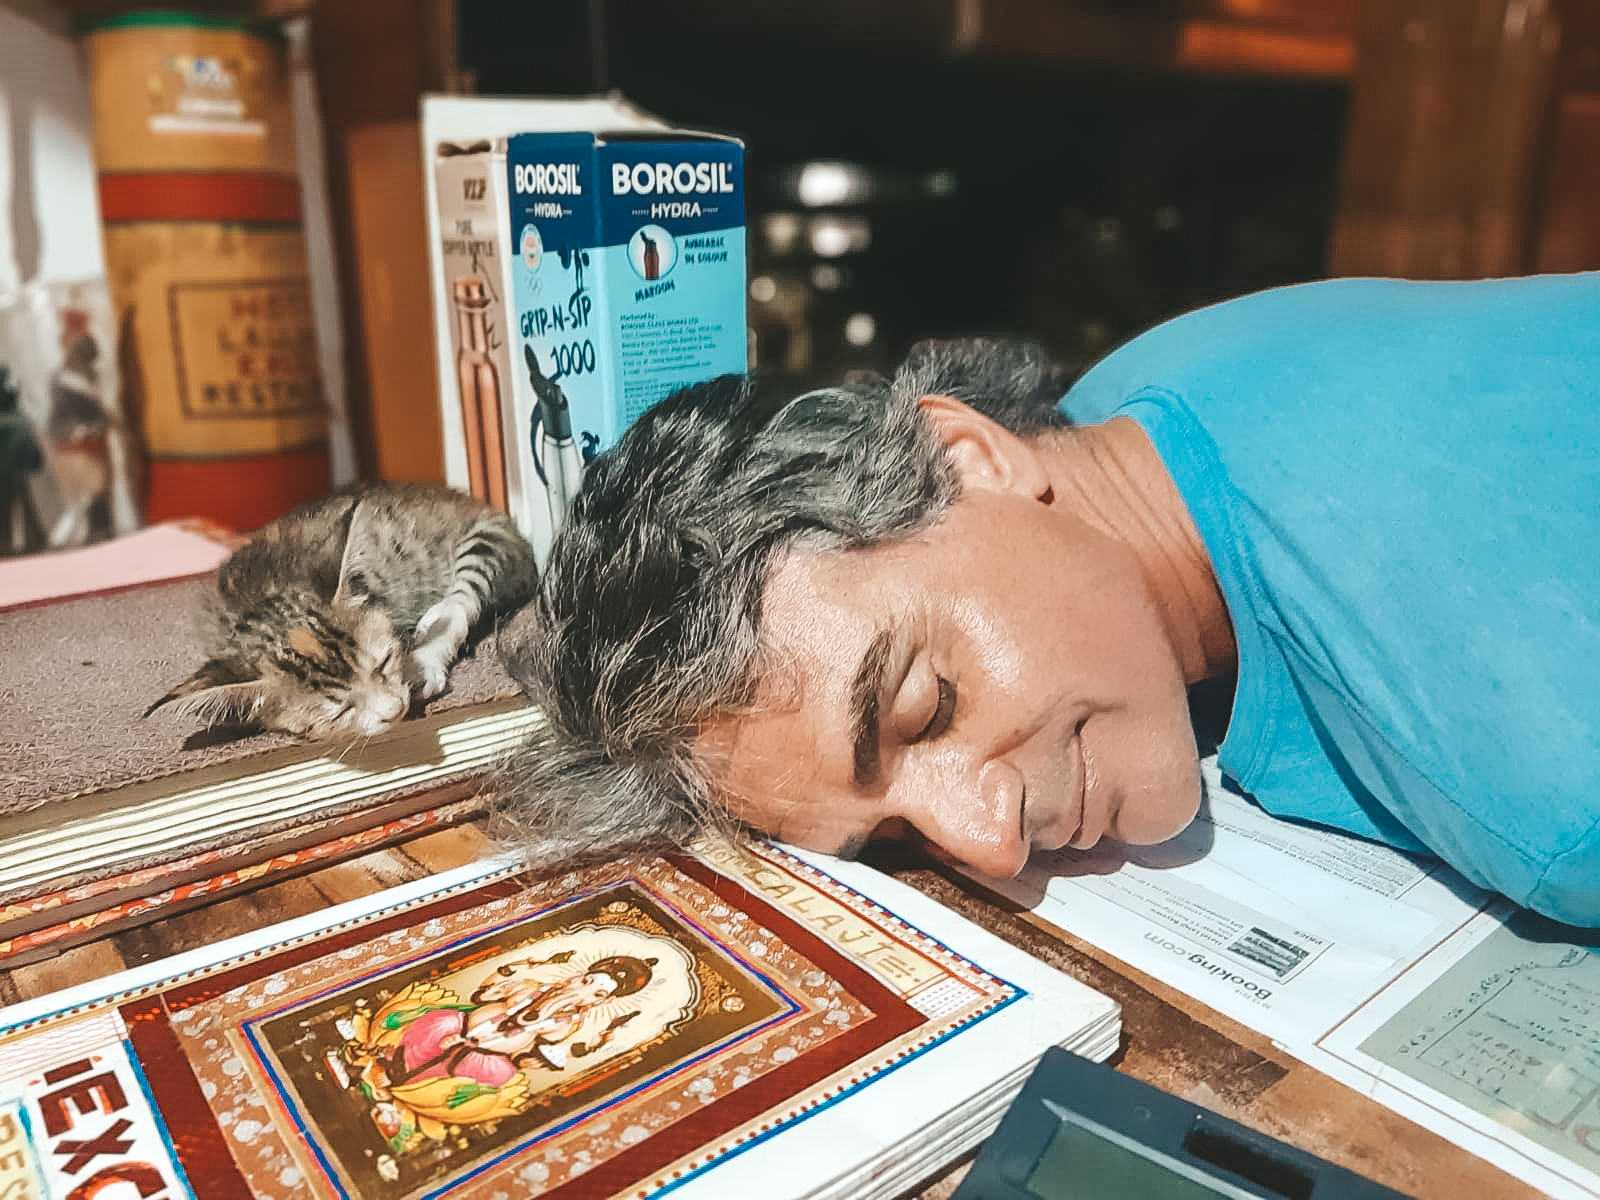 Ahimsa-Tierliebe-Katze schläft neben Mensch-Jivamukti Yoga